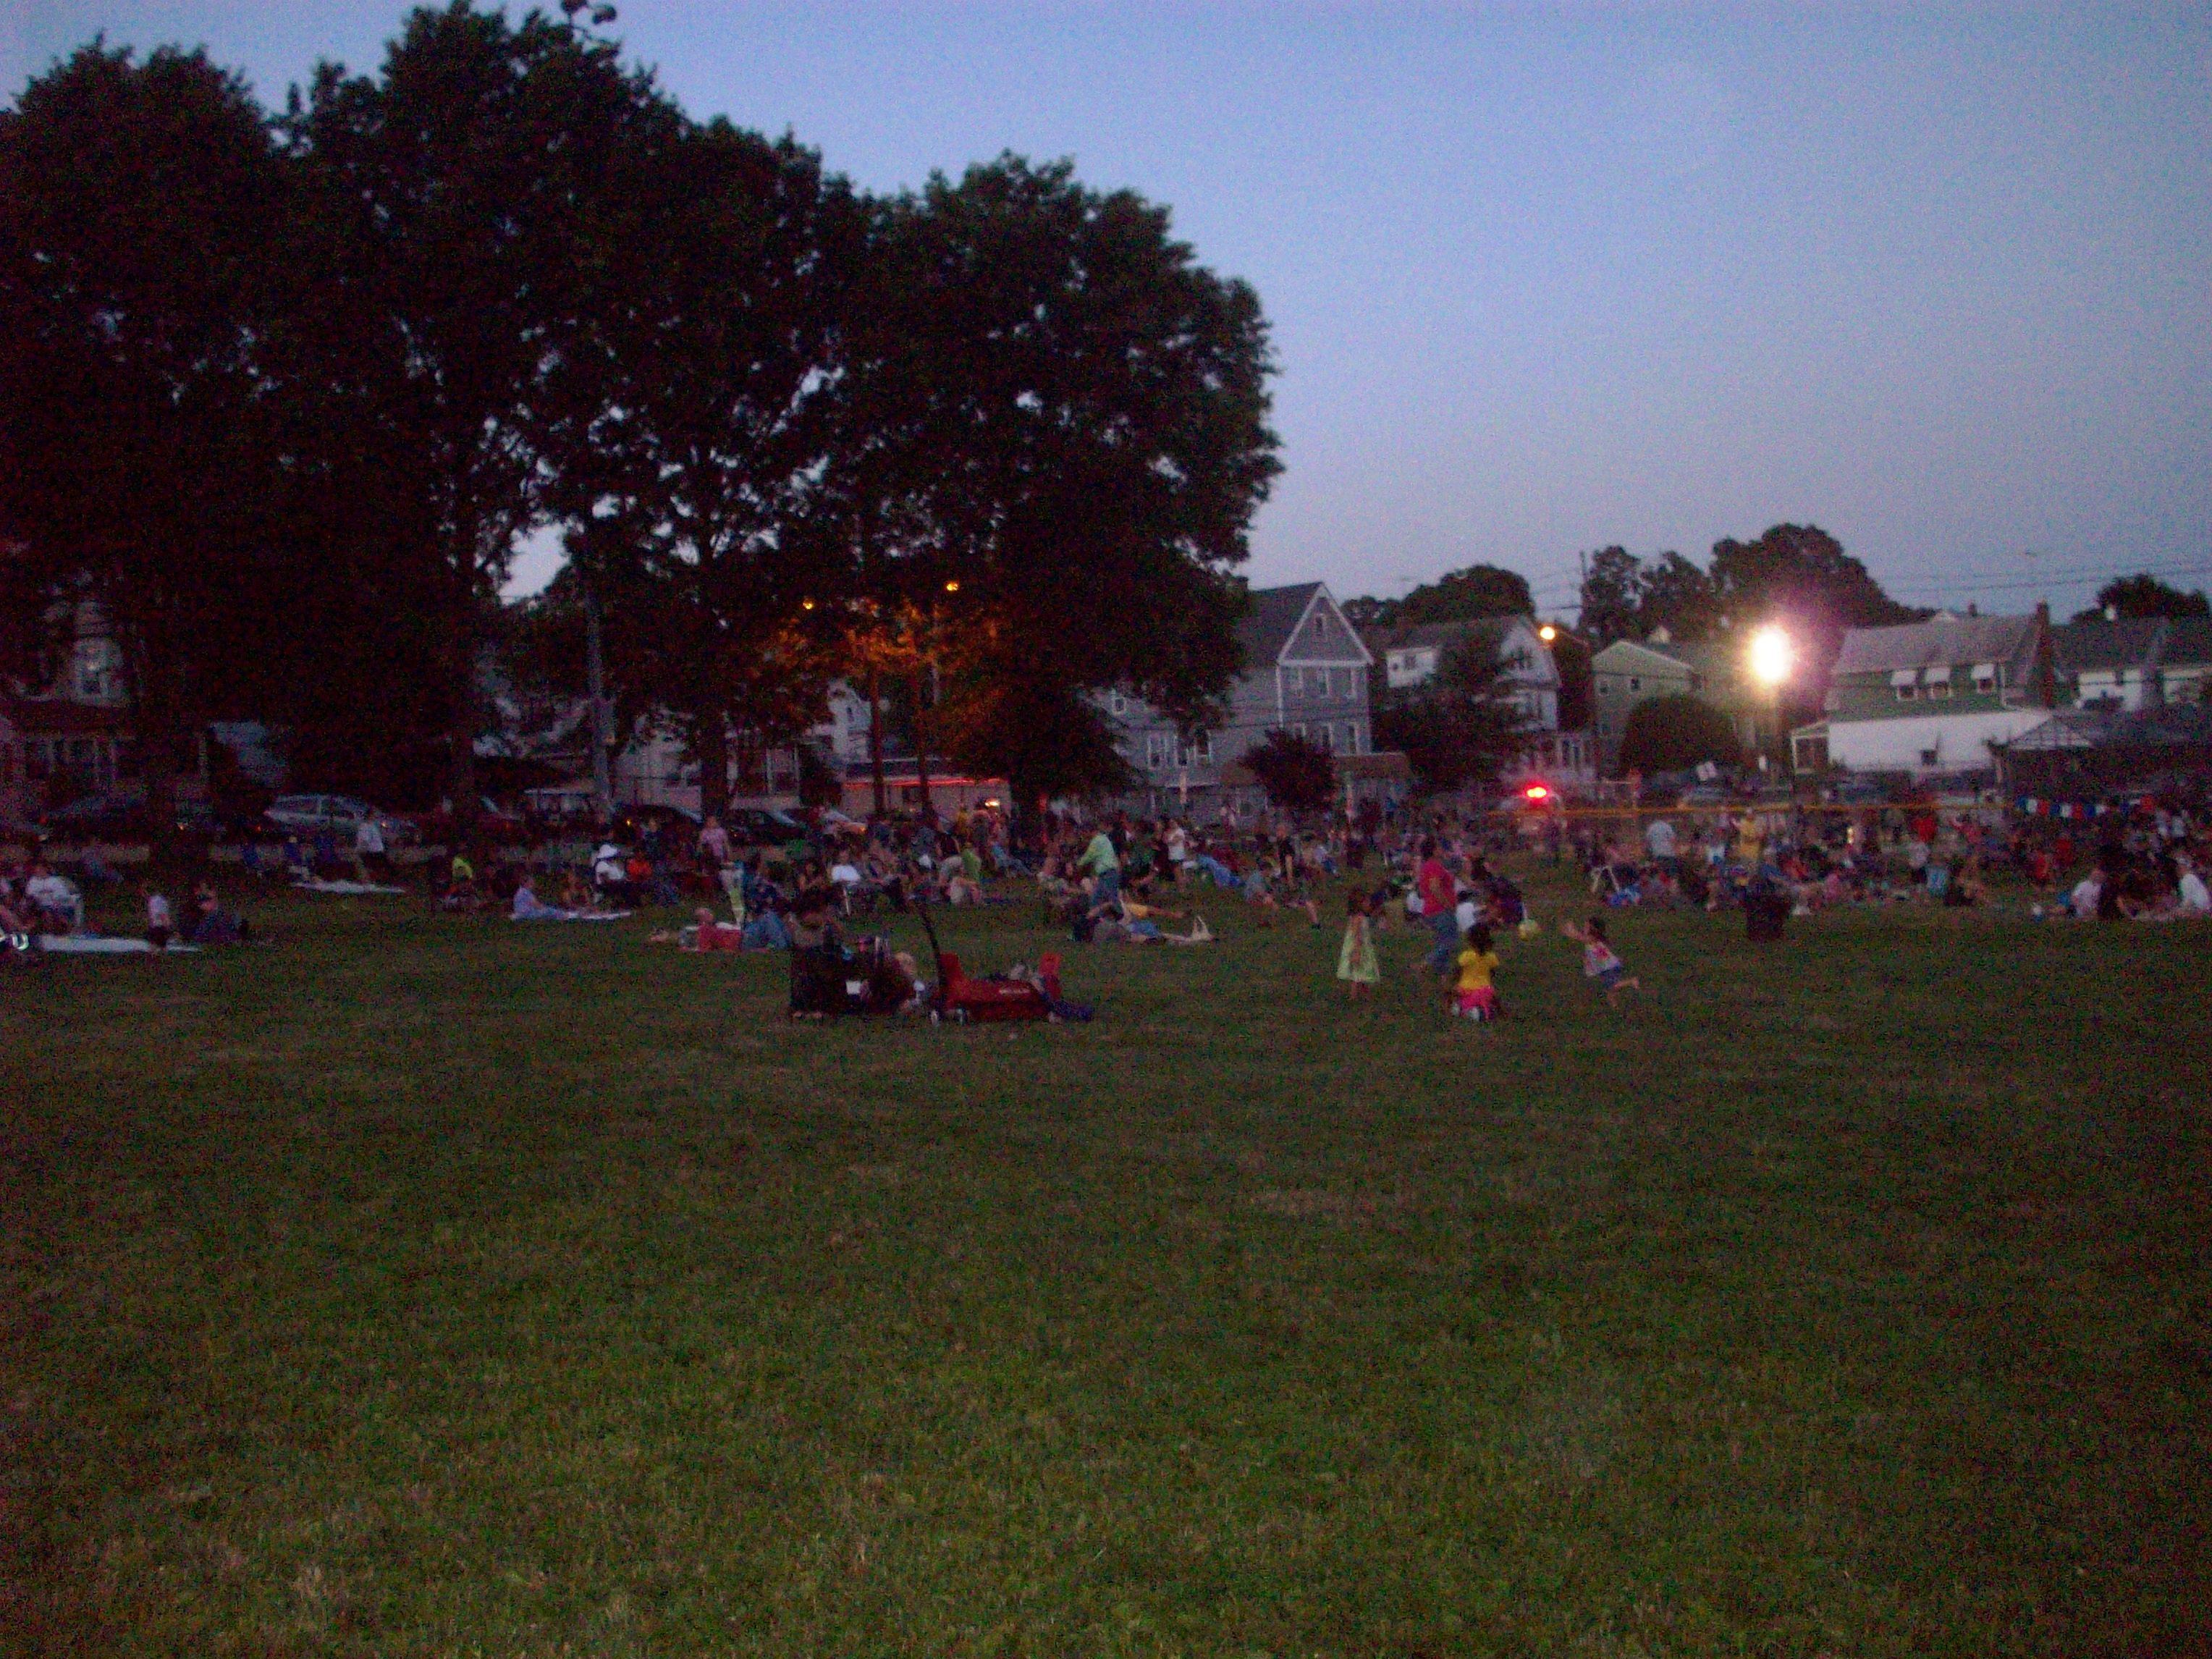 99d44e982c4fb2830f6a_crowds_enjoying_music_at_downtown_festival.jpg